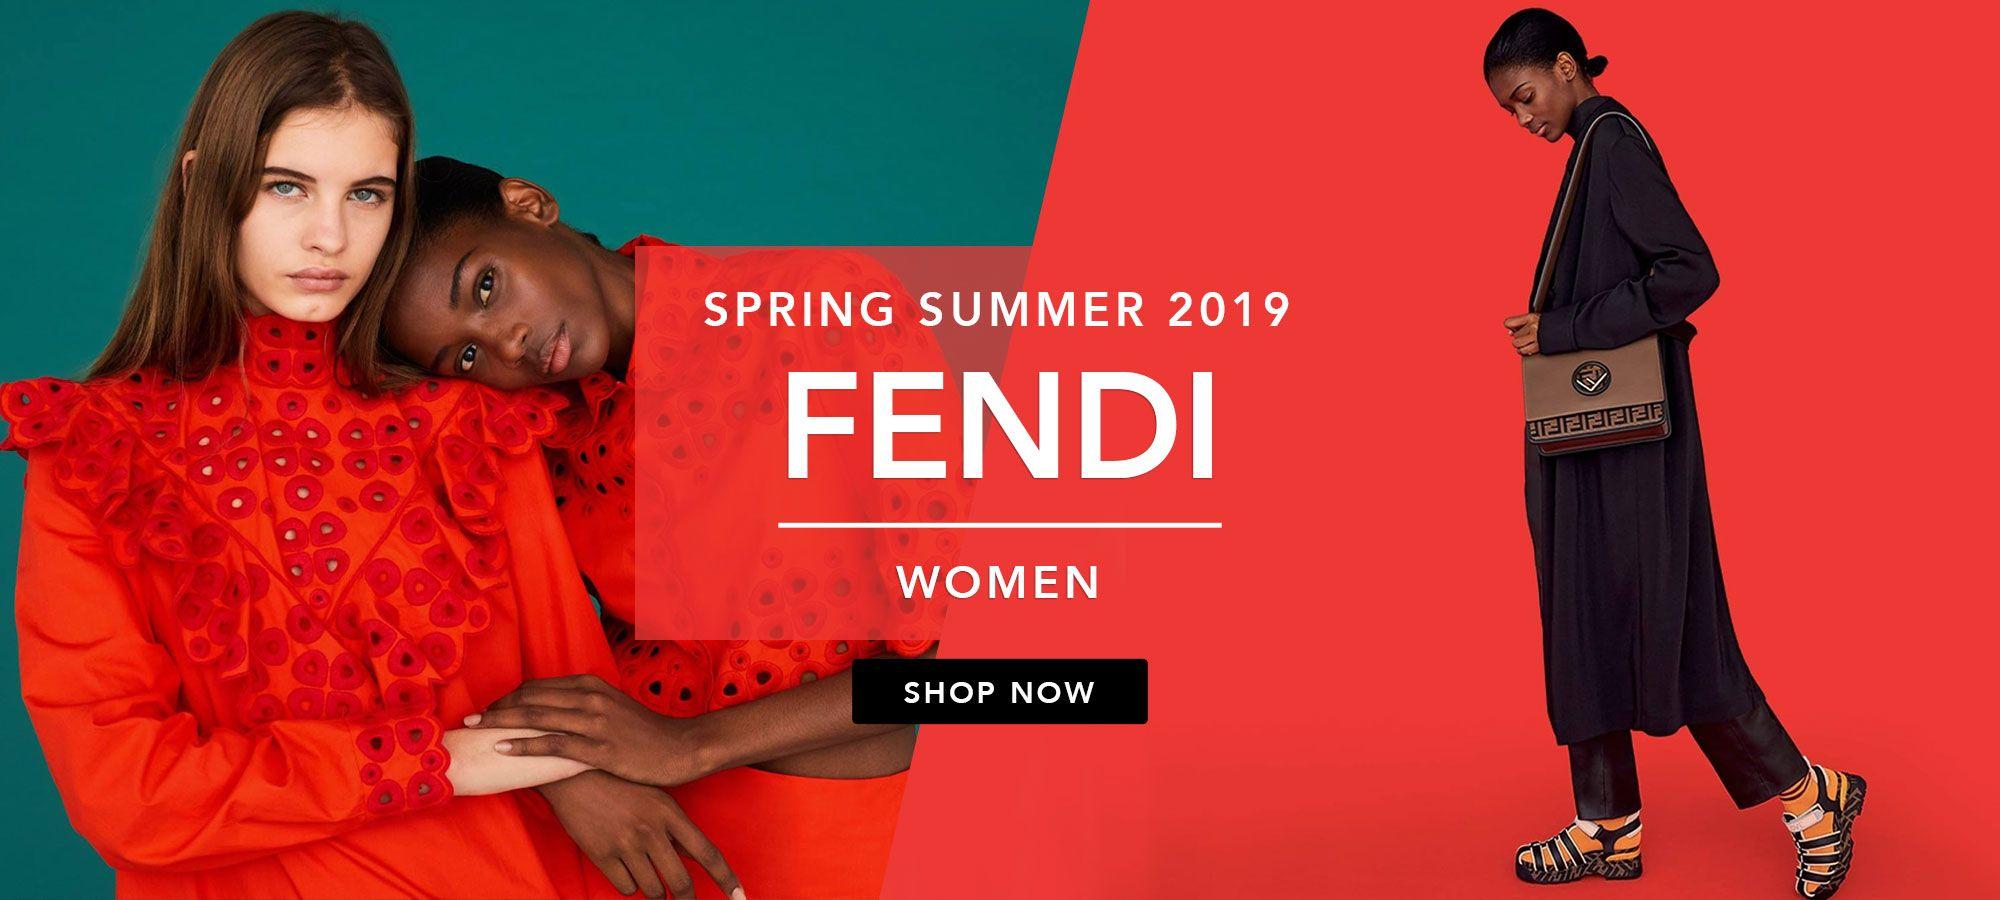 Fendi Women Spring Summer 2019 by italist